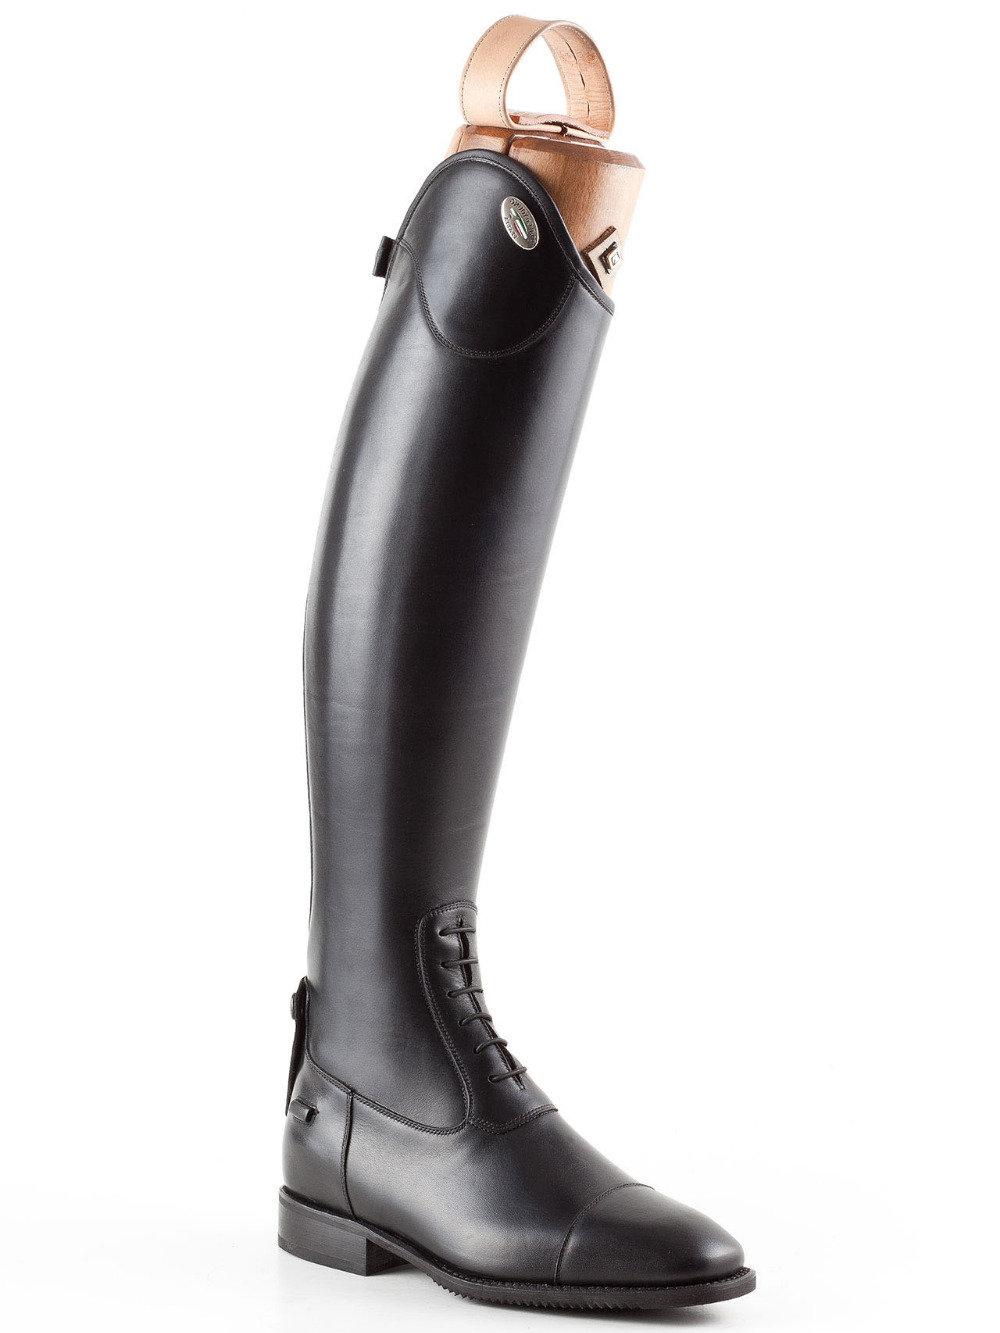 274ee1be65556 DeNiro Boots - CUSTOM & STOCK